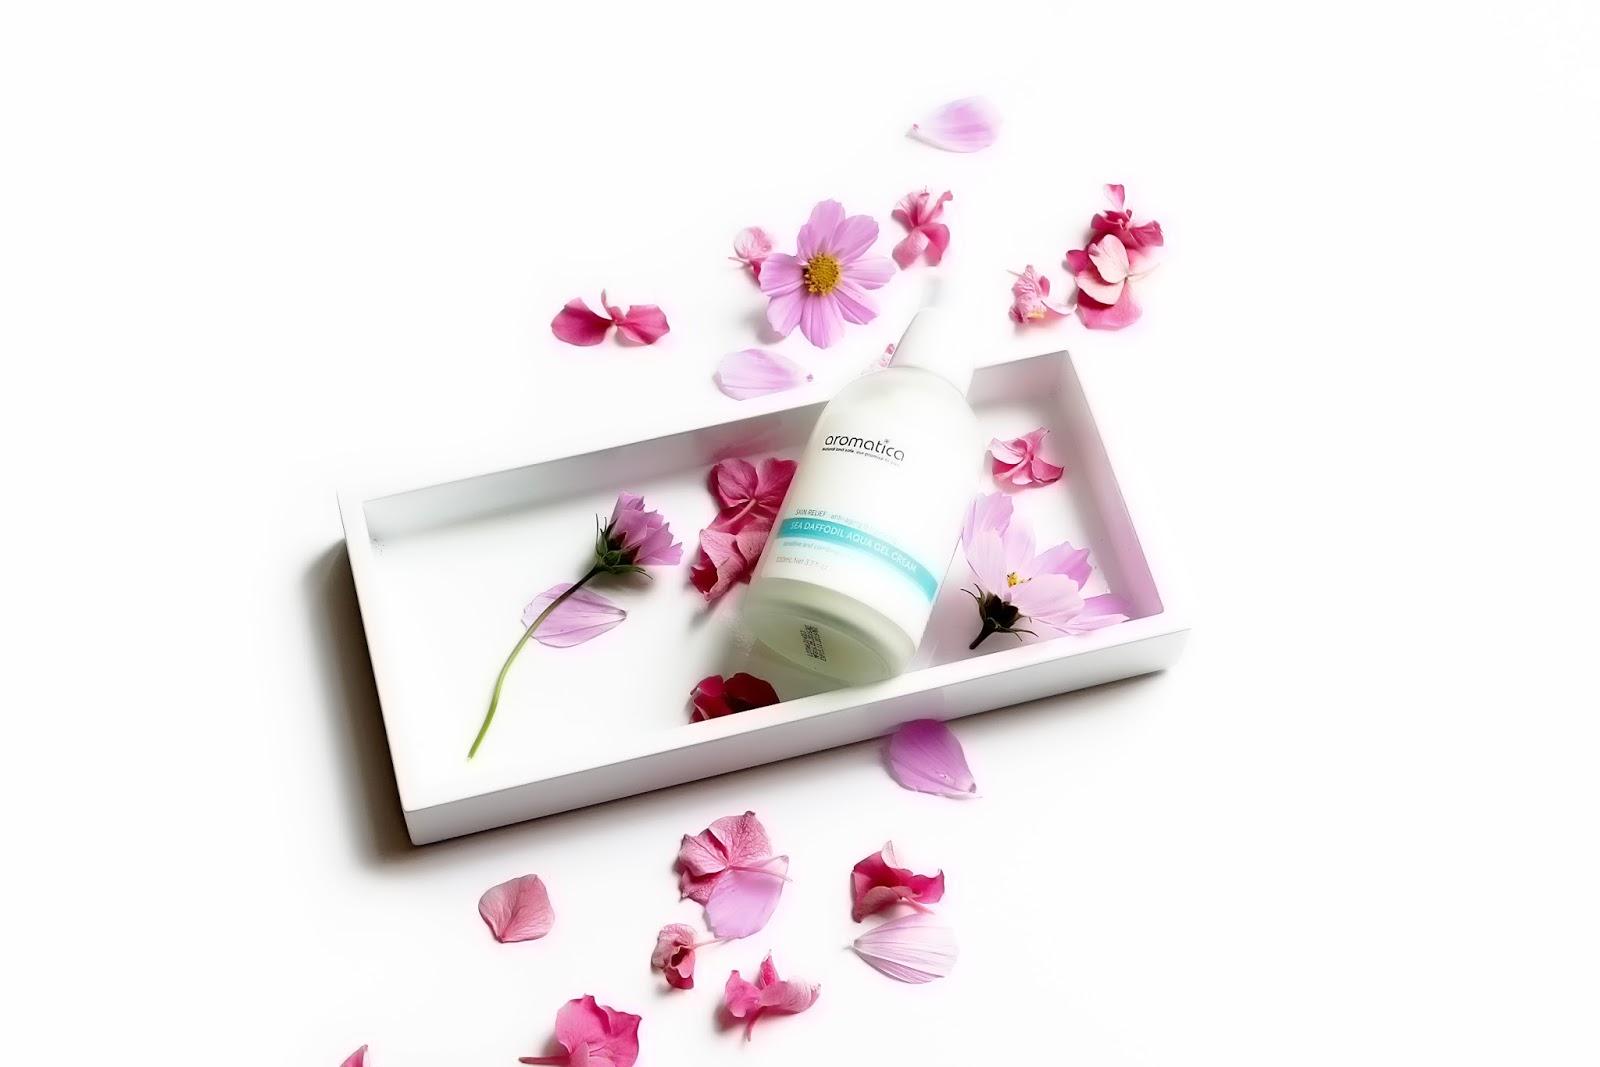 barely-there-beauty-blog-aromatica-sea-daffodil-buttermilk-korean-skincare